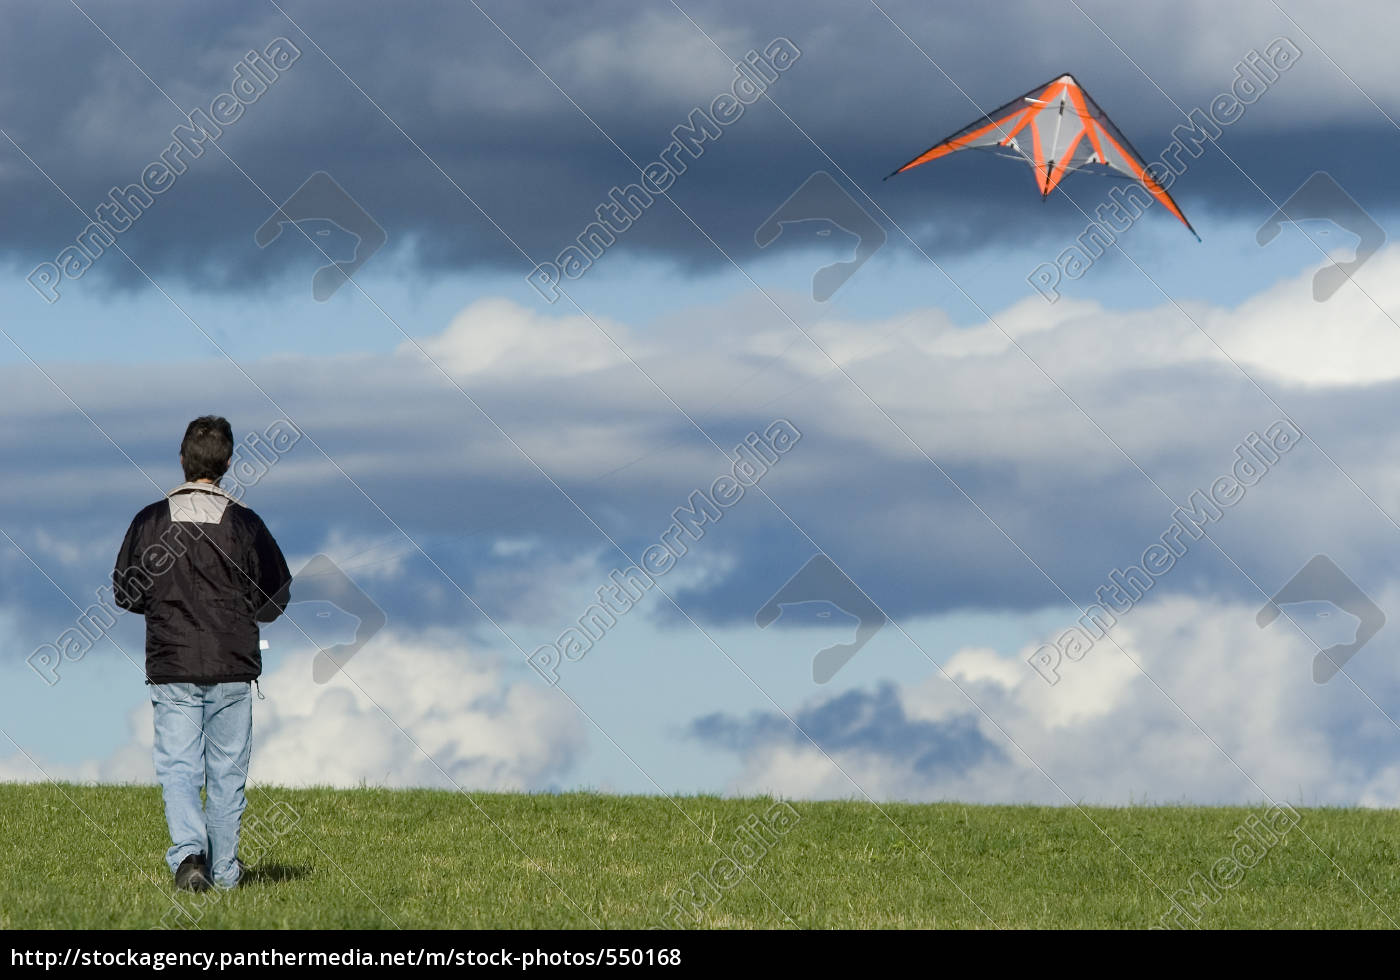 kite, flying, in, autumn - 550168